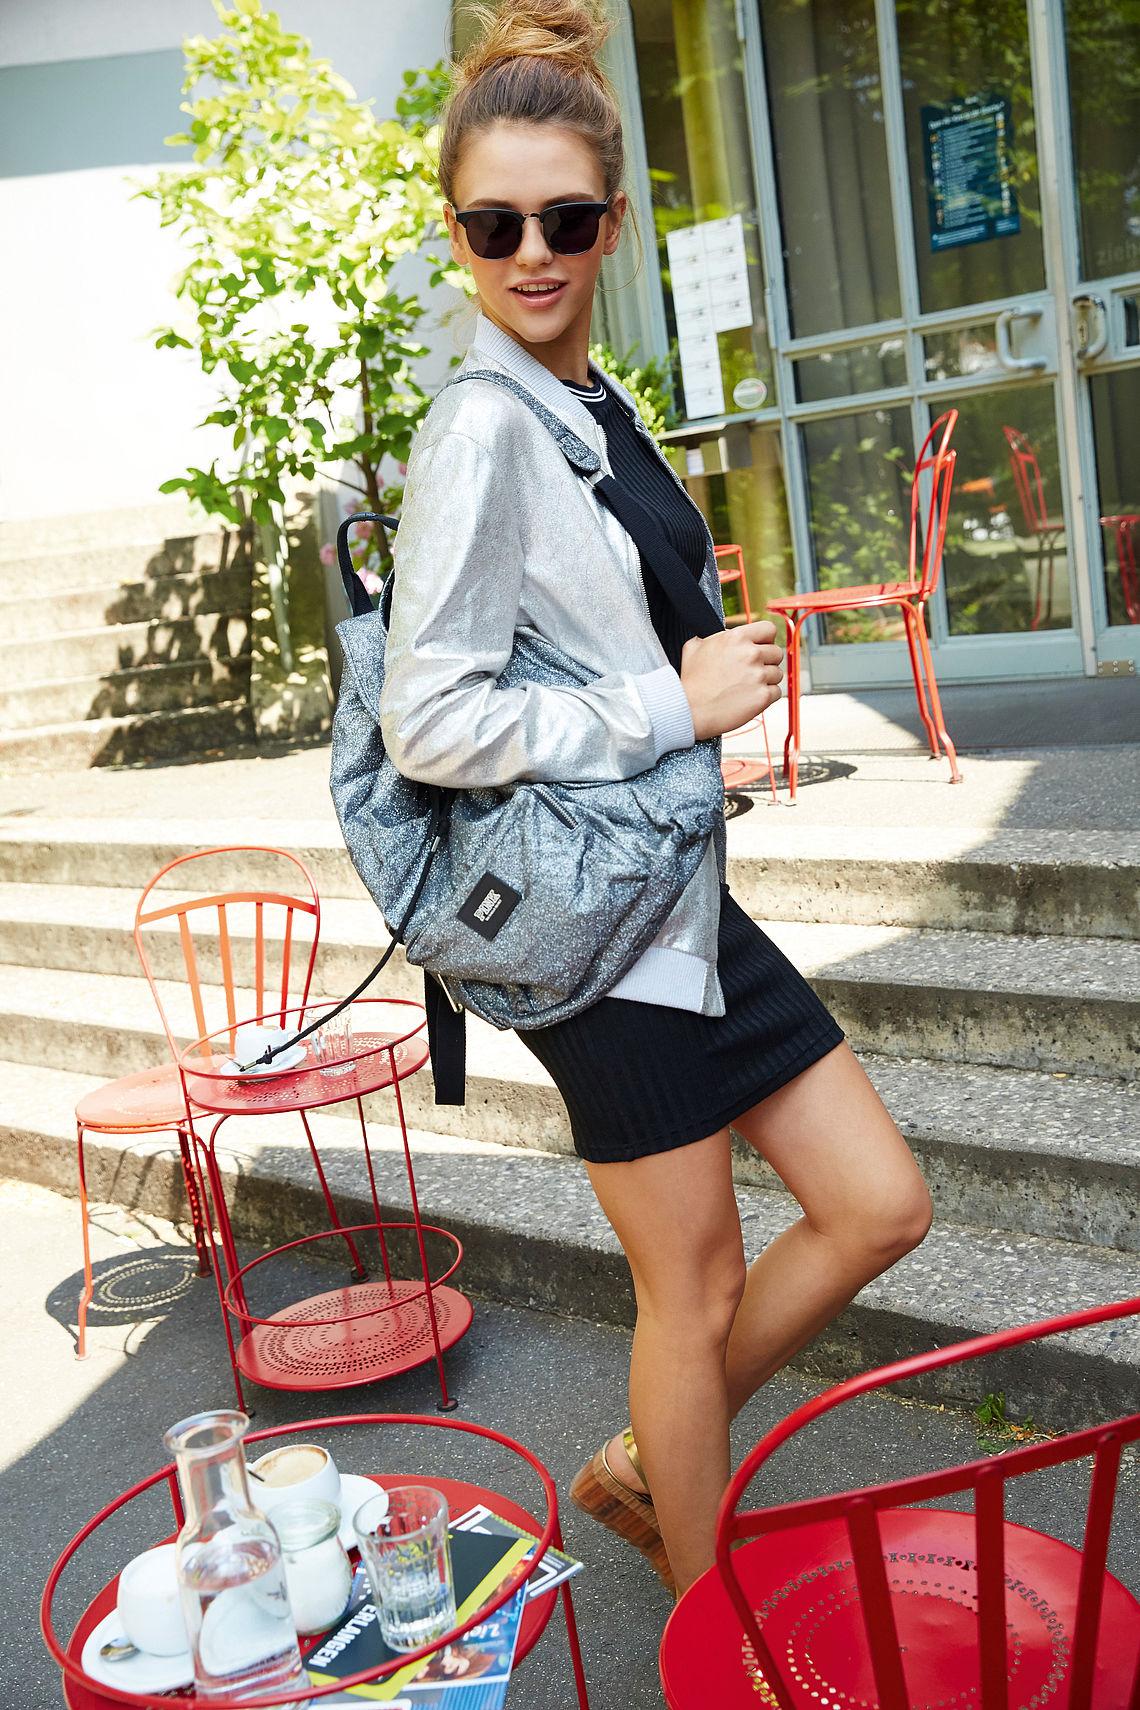 girl with bag, wearing panto sunglasses